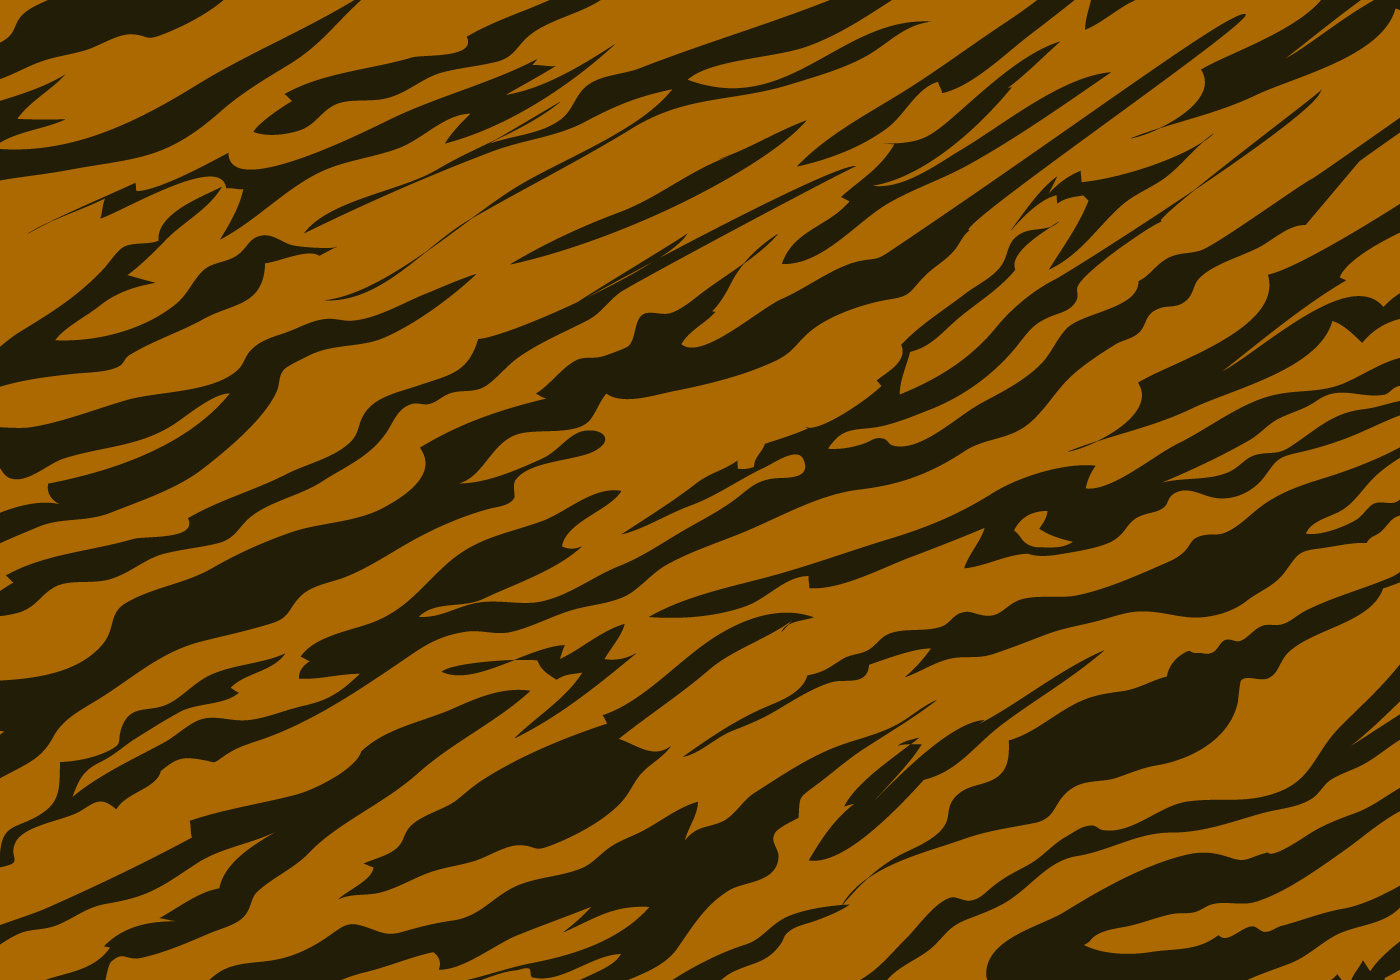 Tiger Stripe Pattern Background